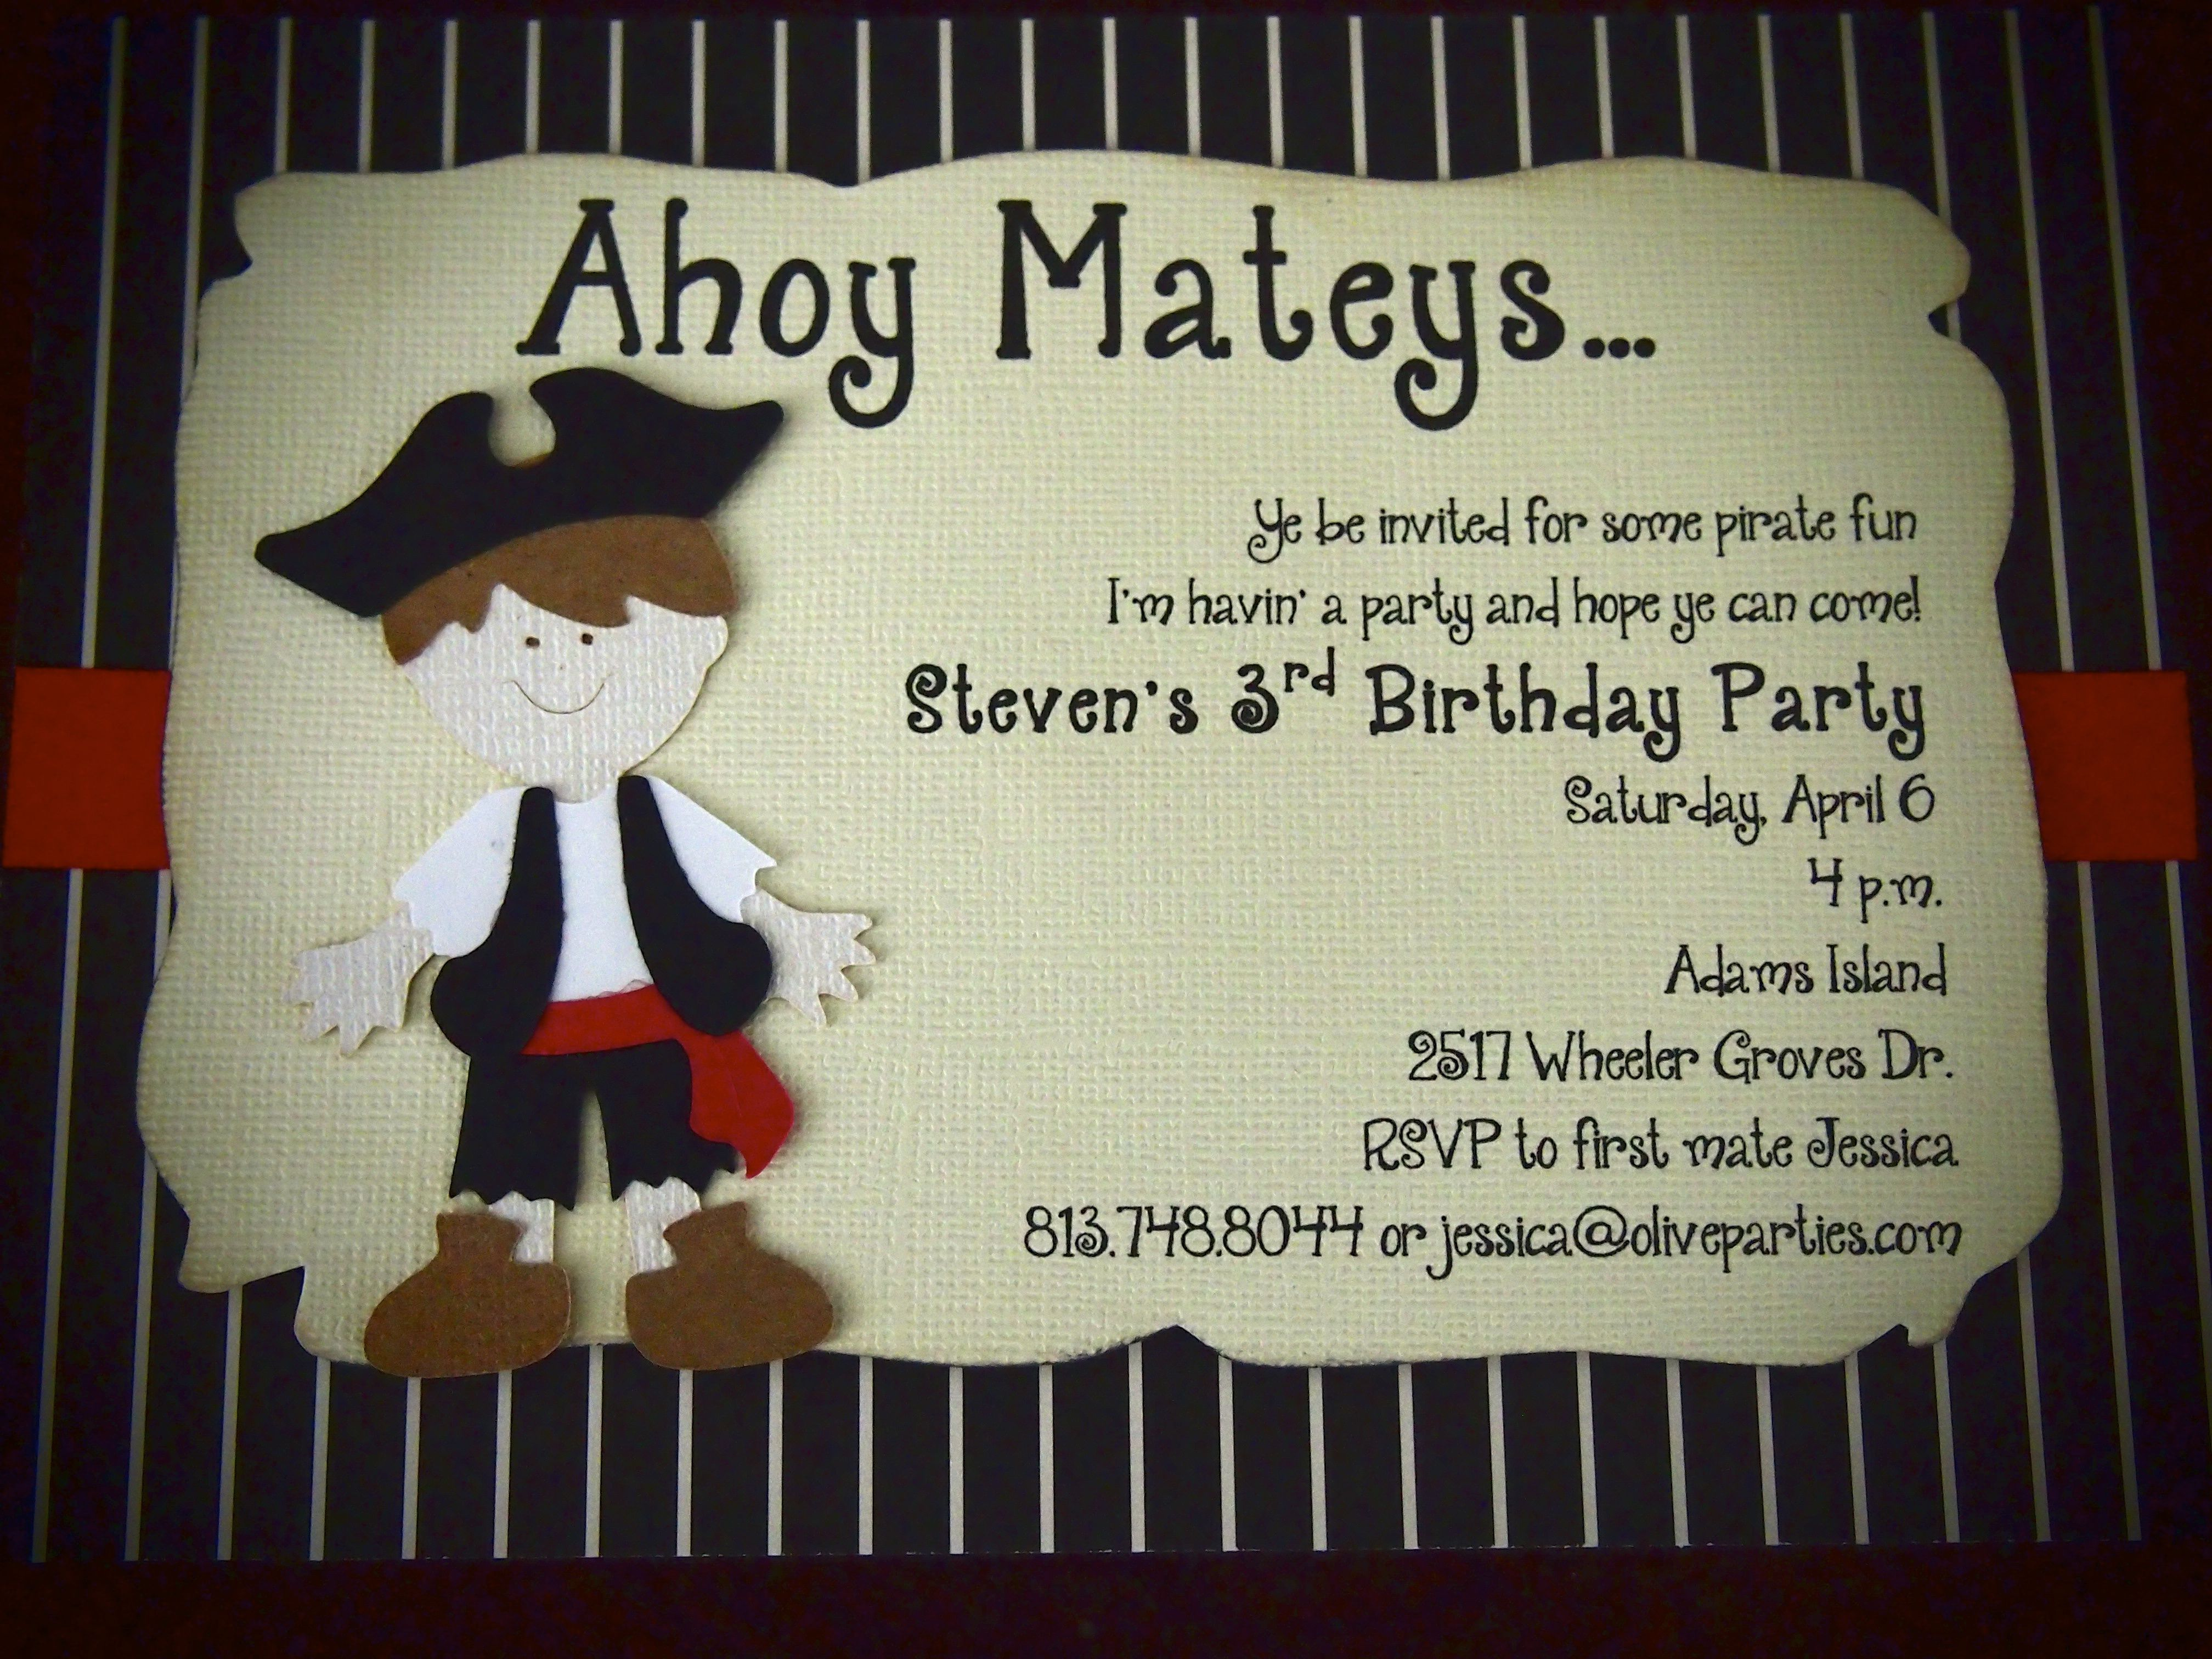 disney princess party invitation templates%0A Party invitations